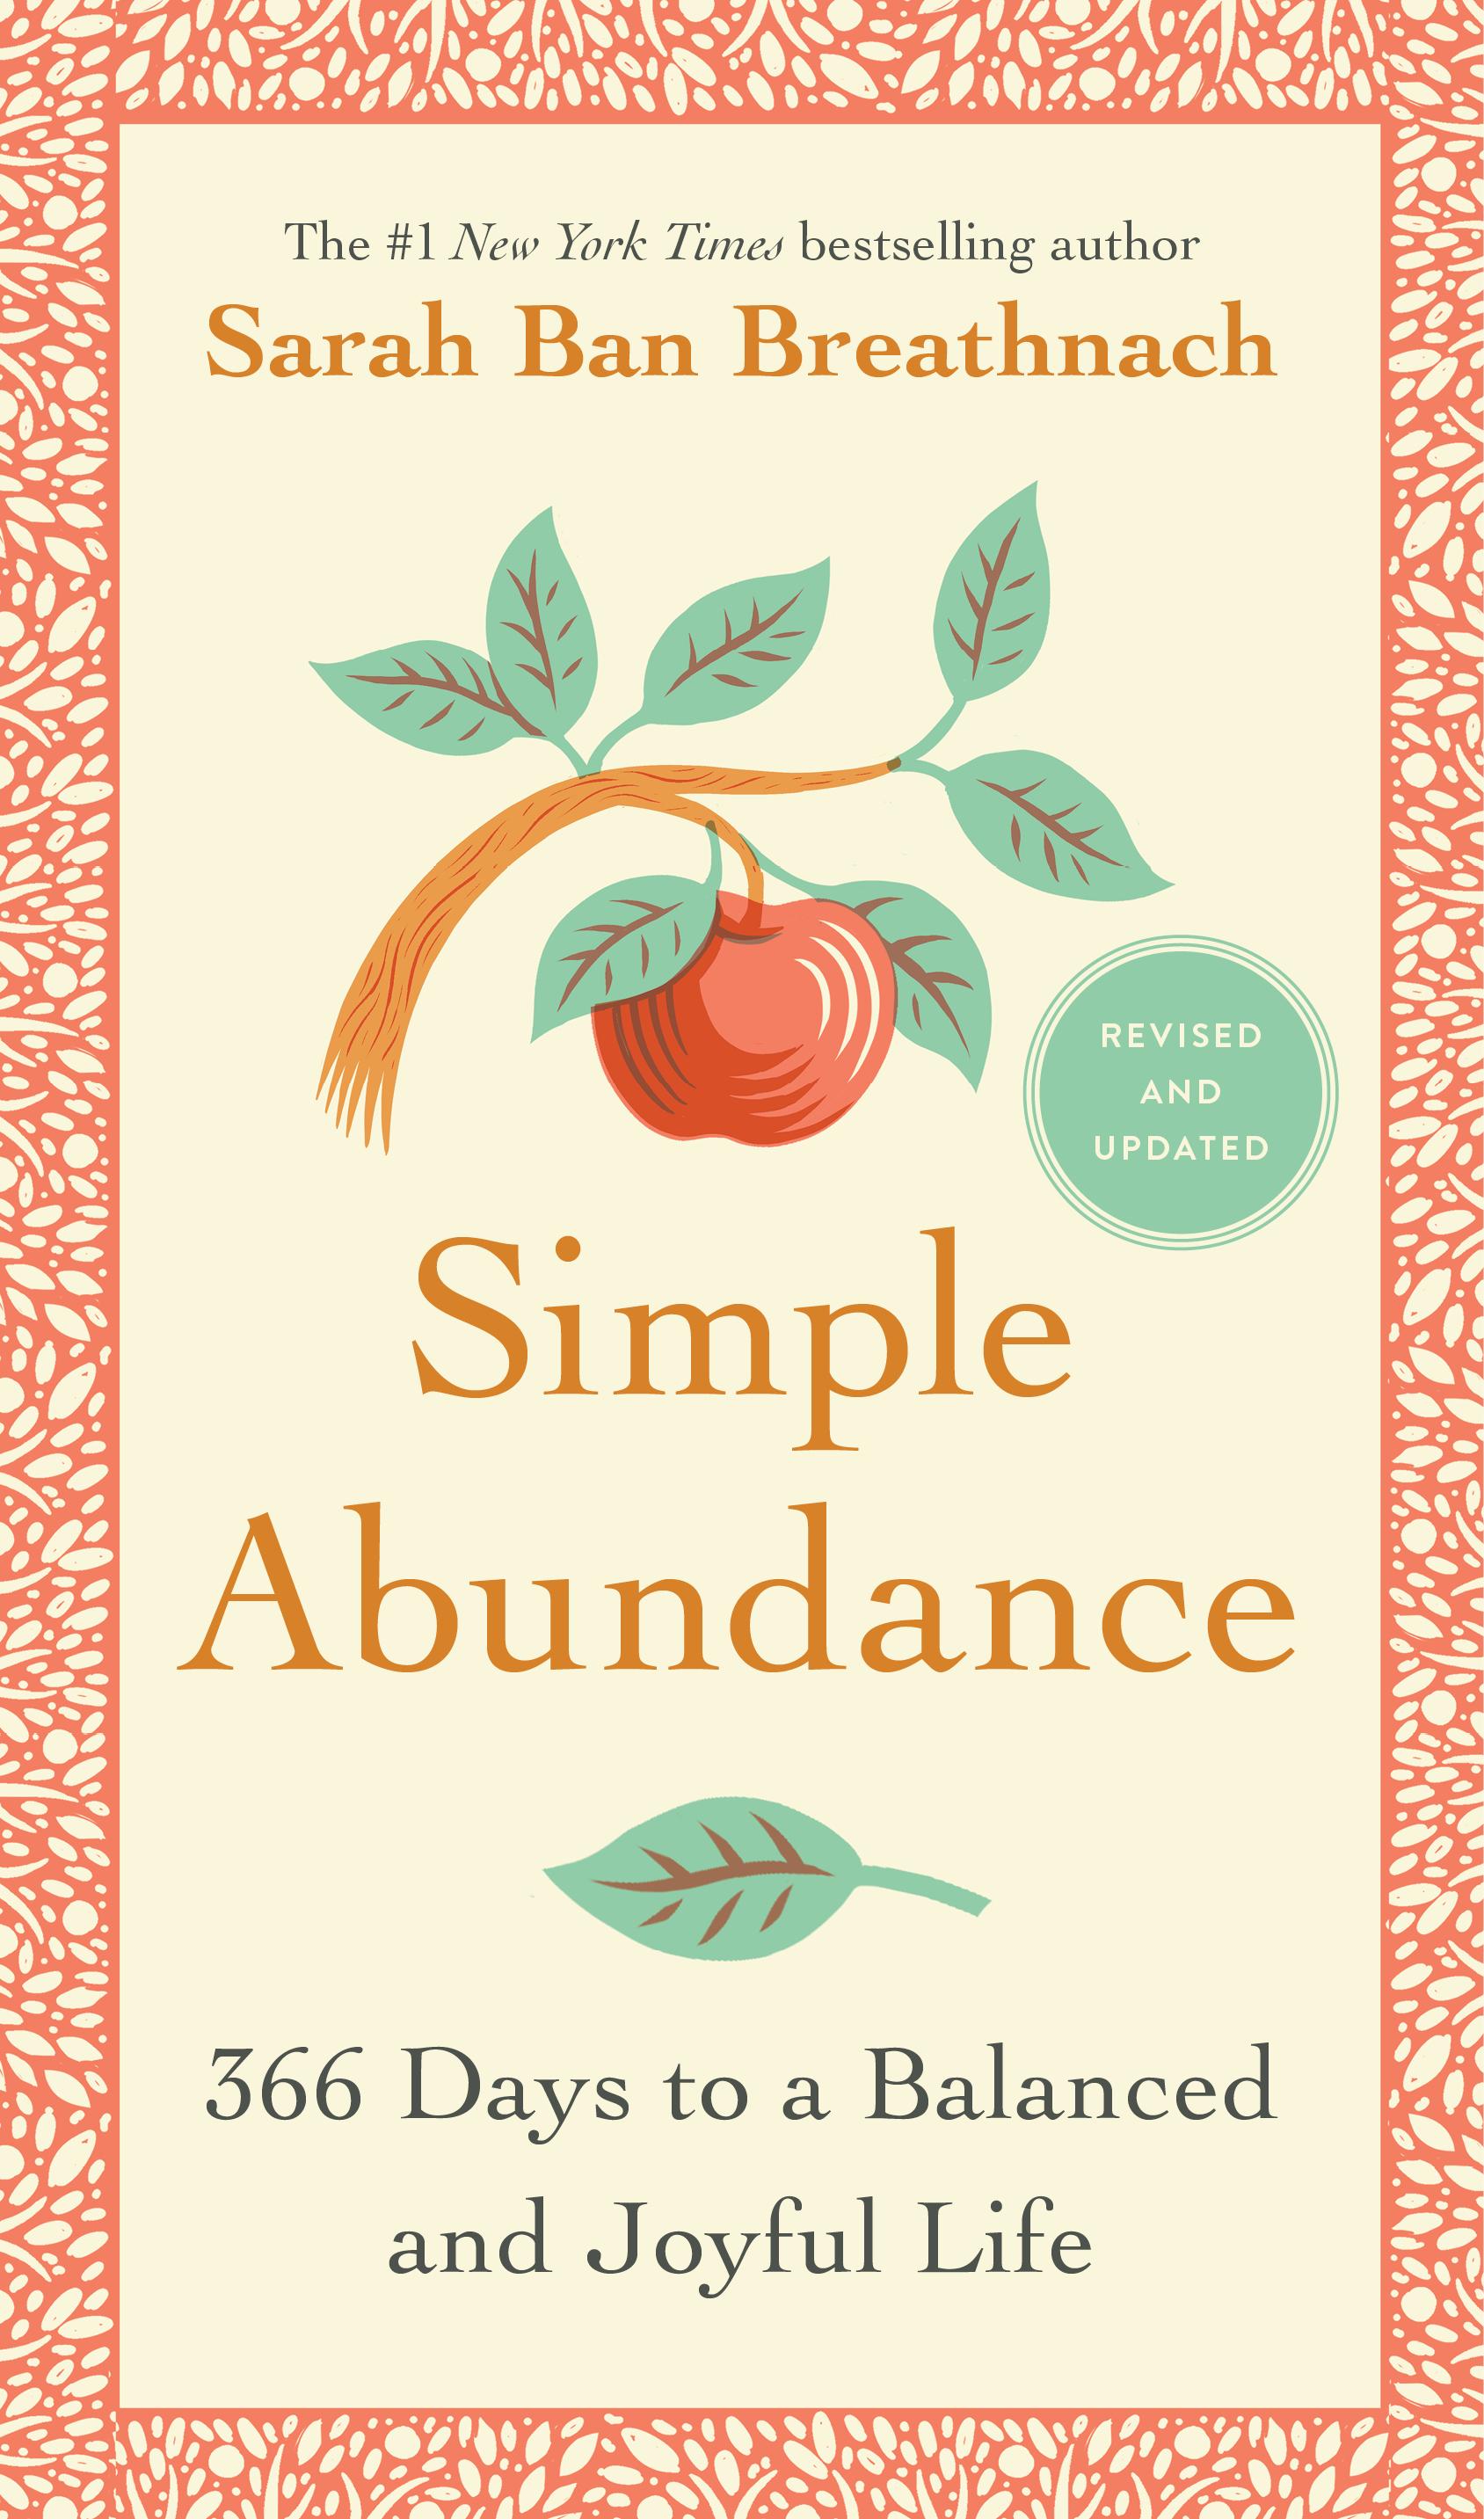 SimpleAbundance cover FINAL_0130